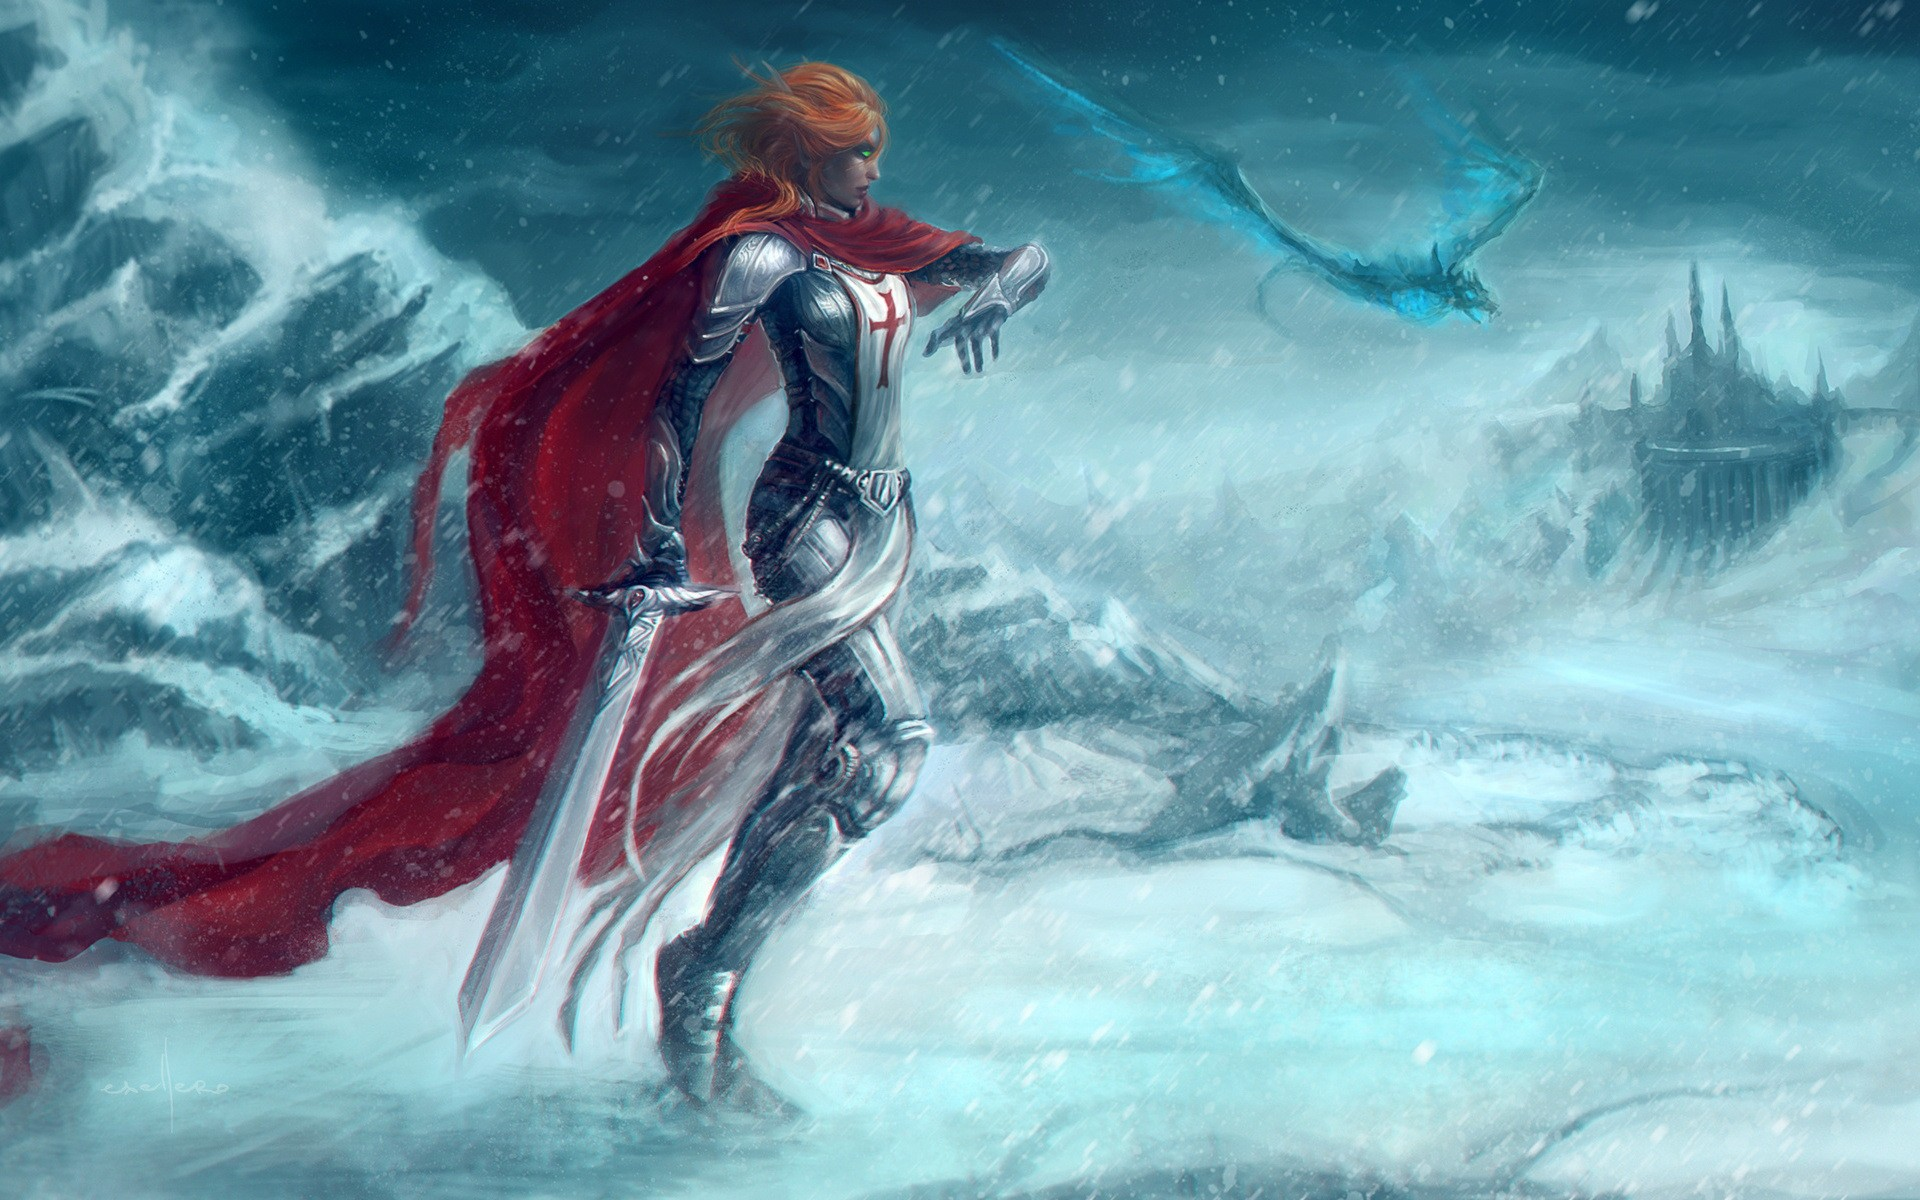 дракон, World of Warcraft, зима, меч, фантастическое исскуство